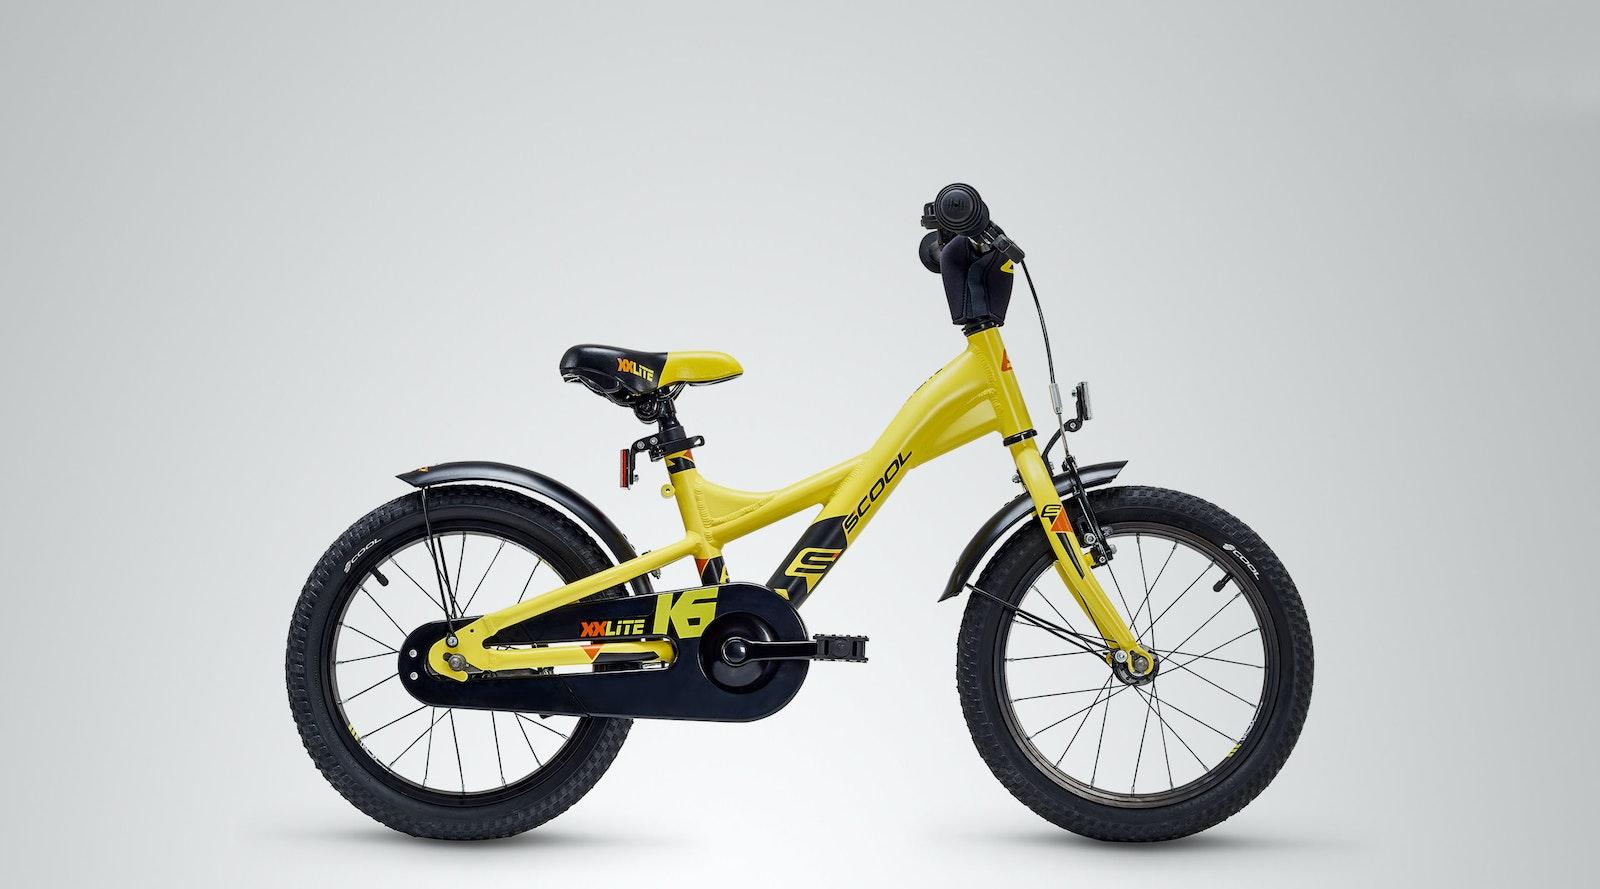 S'Cool Xx Lite 16 2019 | 101856246 | BikeExchange